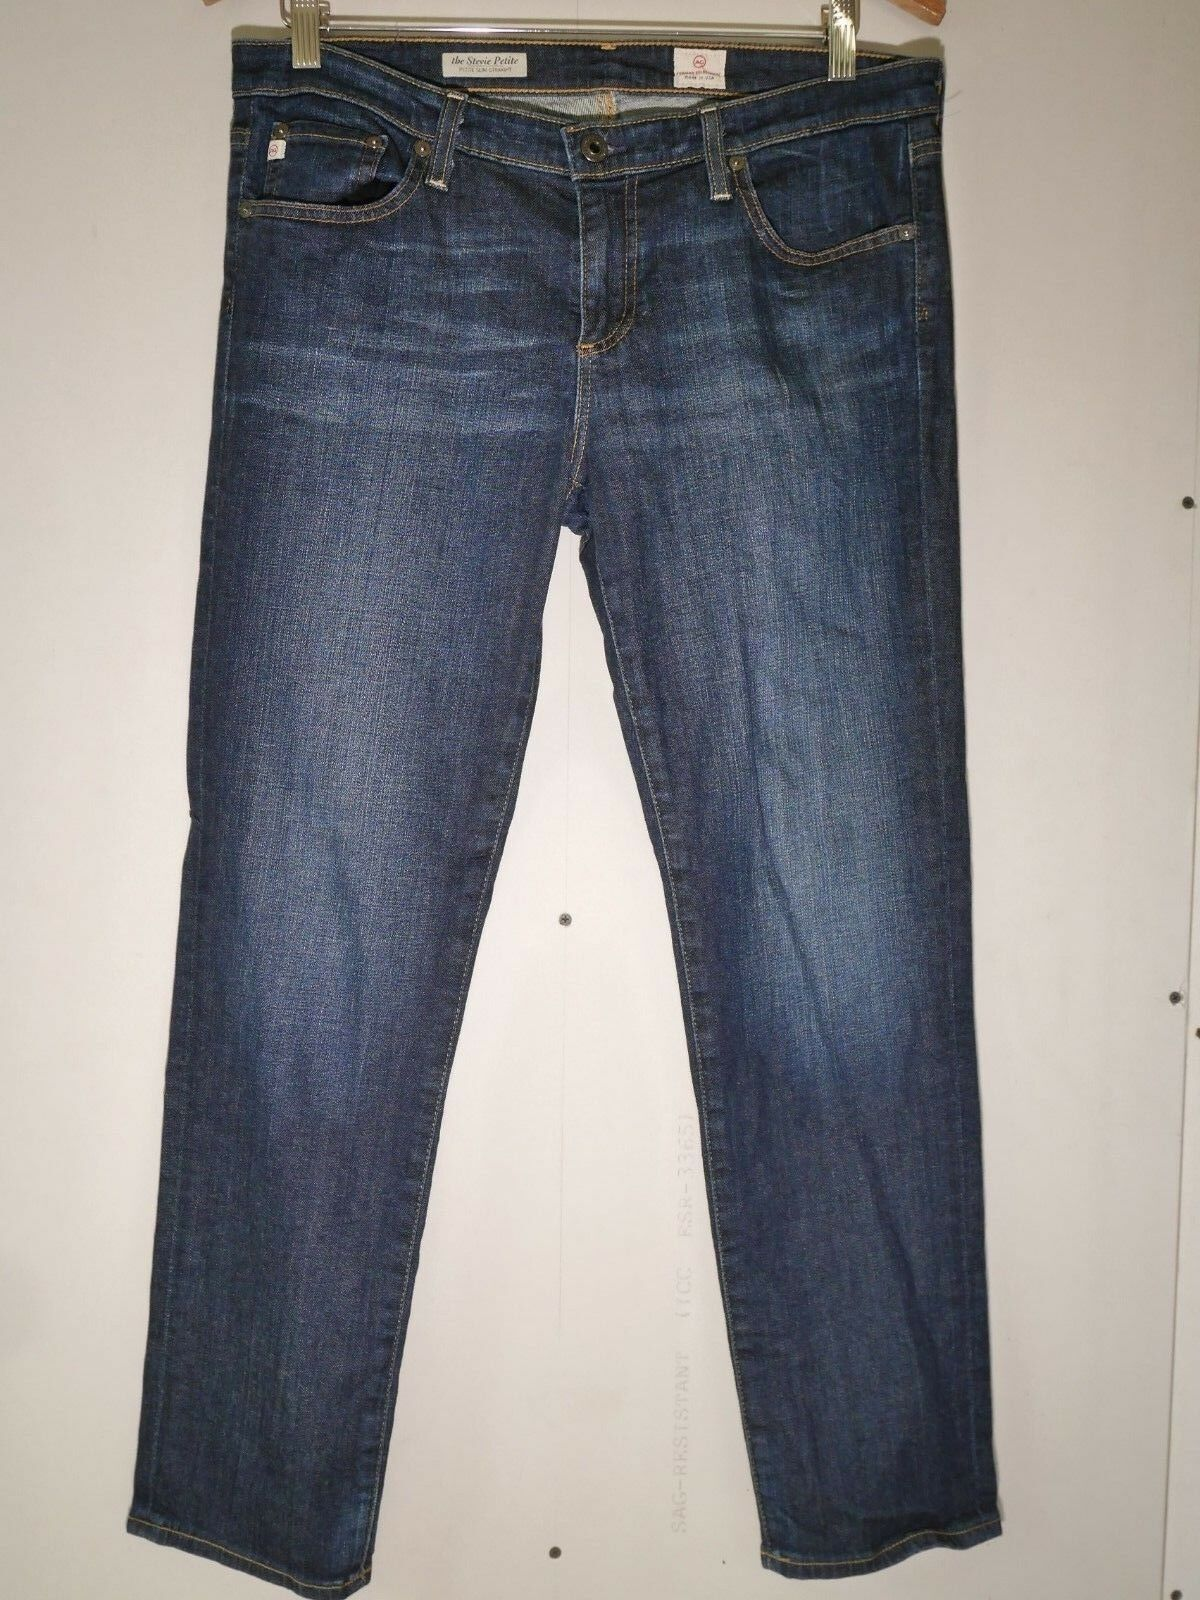 AG Jeans - the Stevie Petite - Petite Slim Straight Jean Dark Wash Size 32R